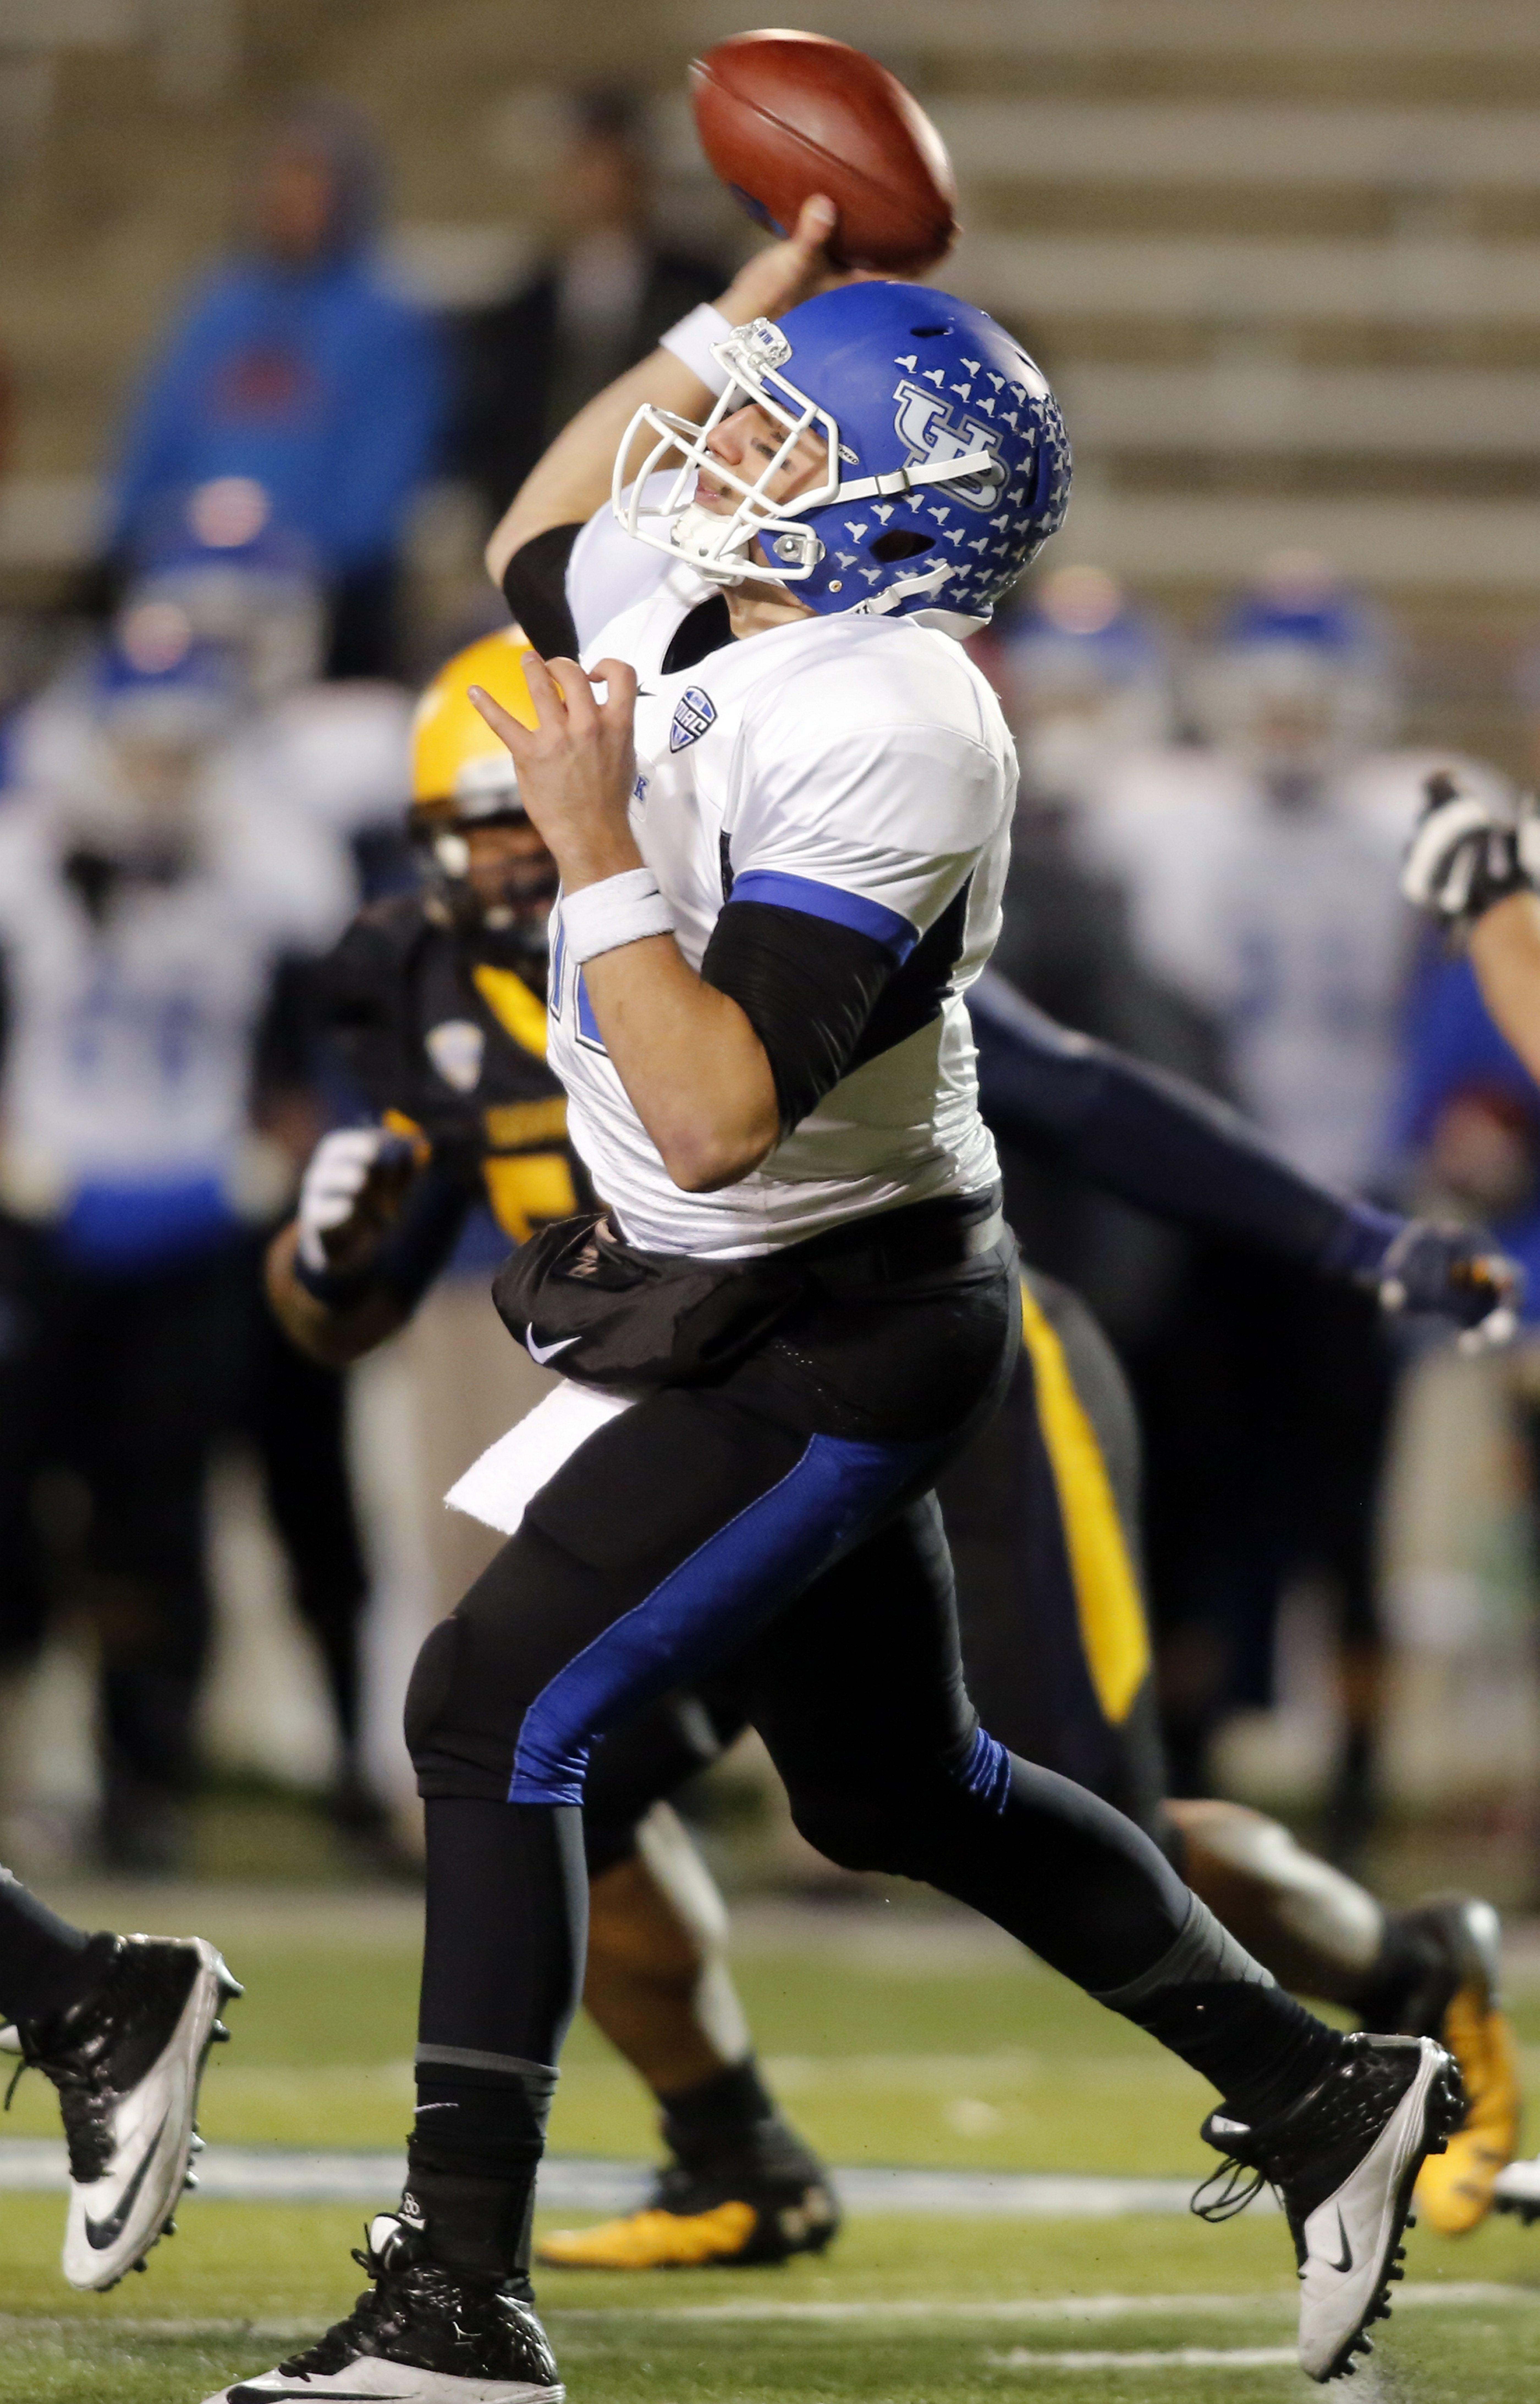 Buffalo quarterback Joe Licata threw for 497 yards. For a photo gallery from the game, go to BuffaloNews.com.